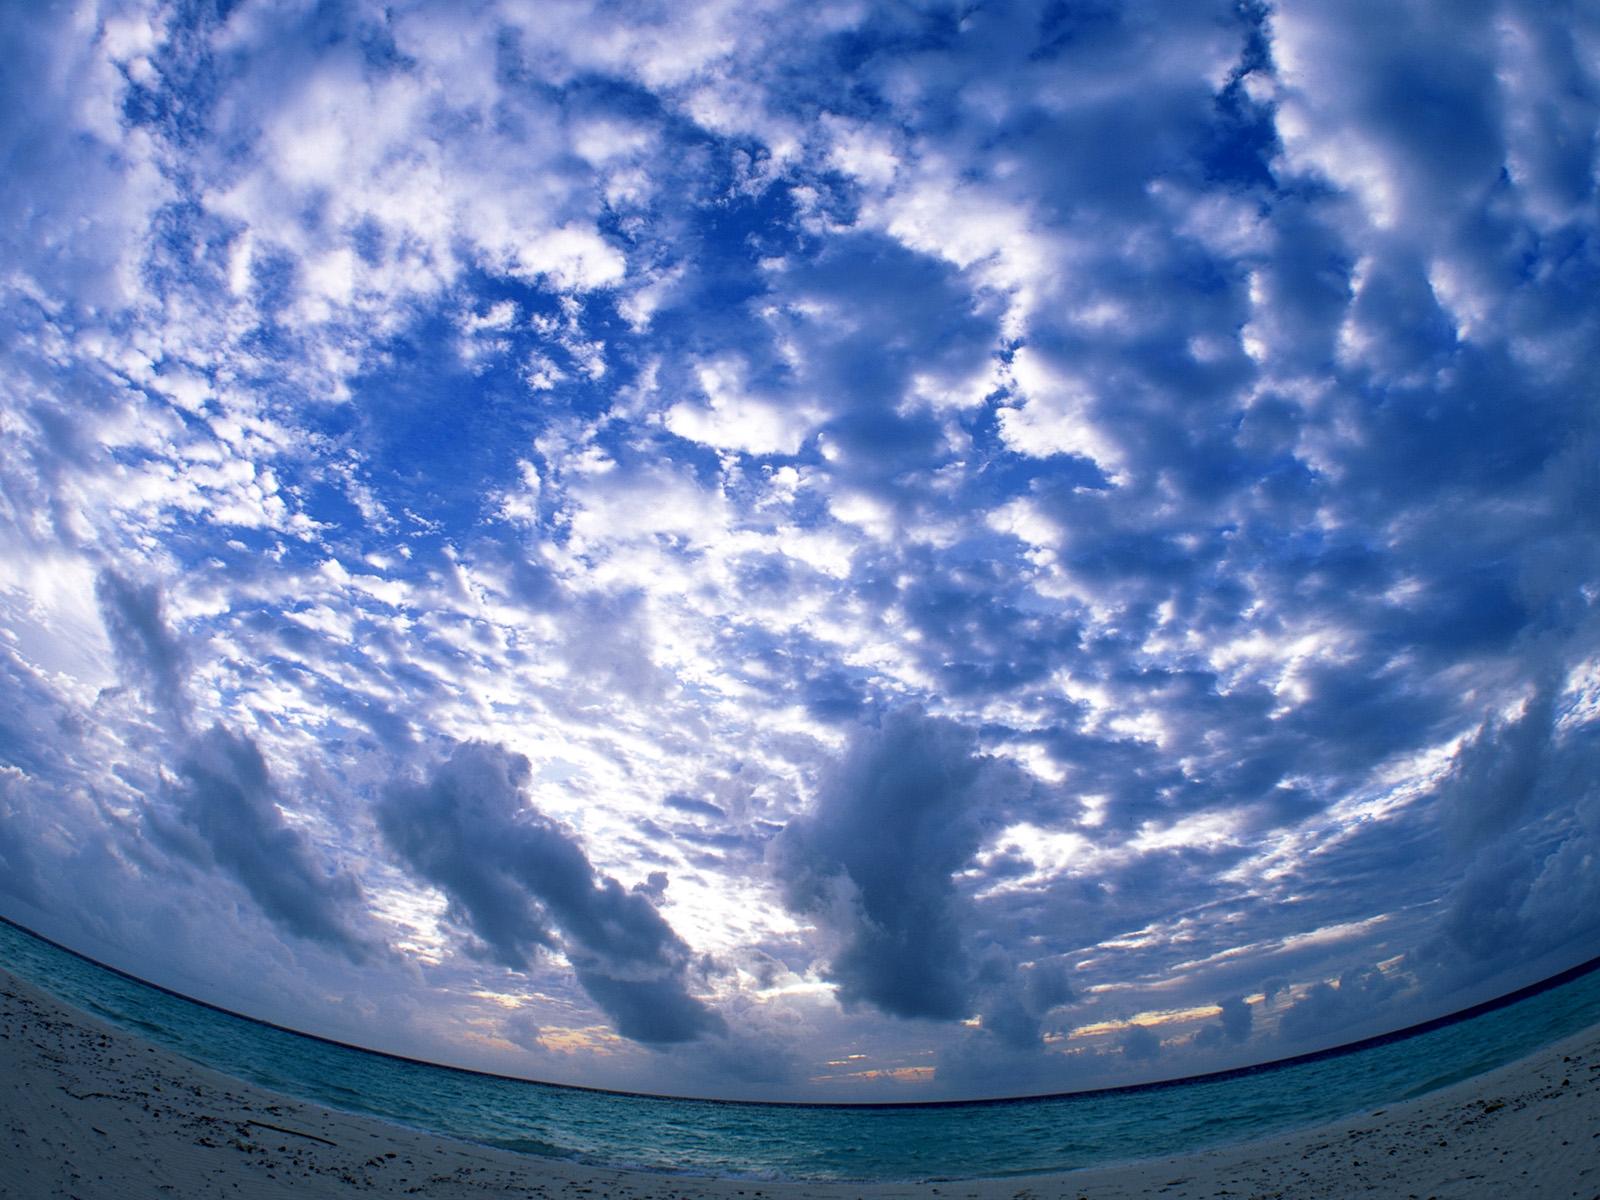 Sky Wallpapers: Free Wallpapers: Unseen Beutiful Sky Water Cloud Hd